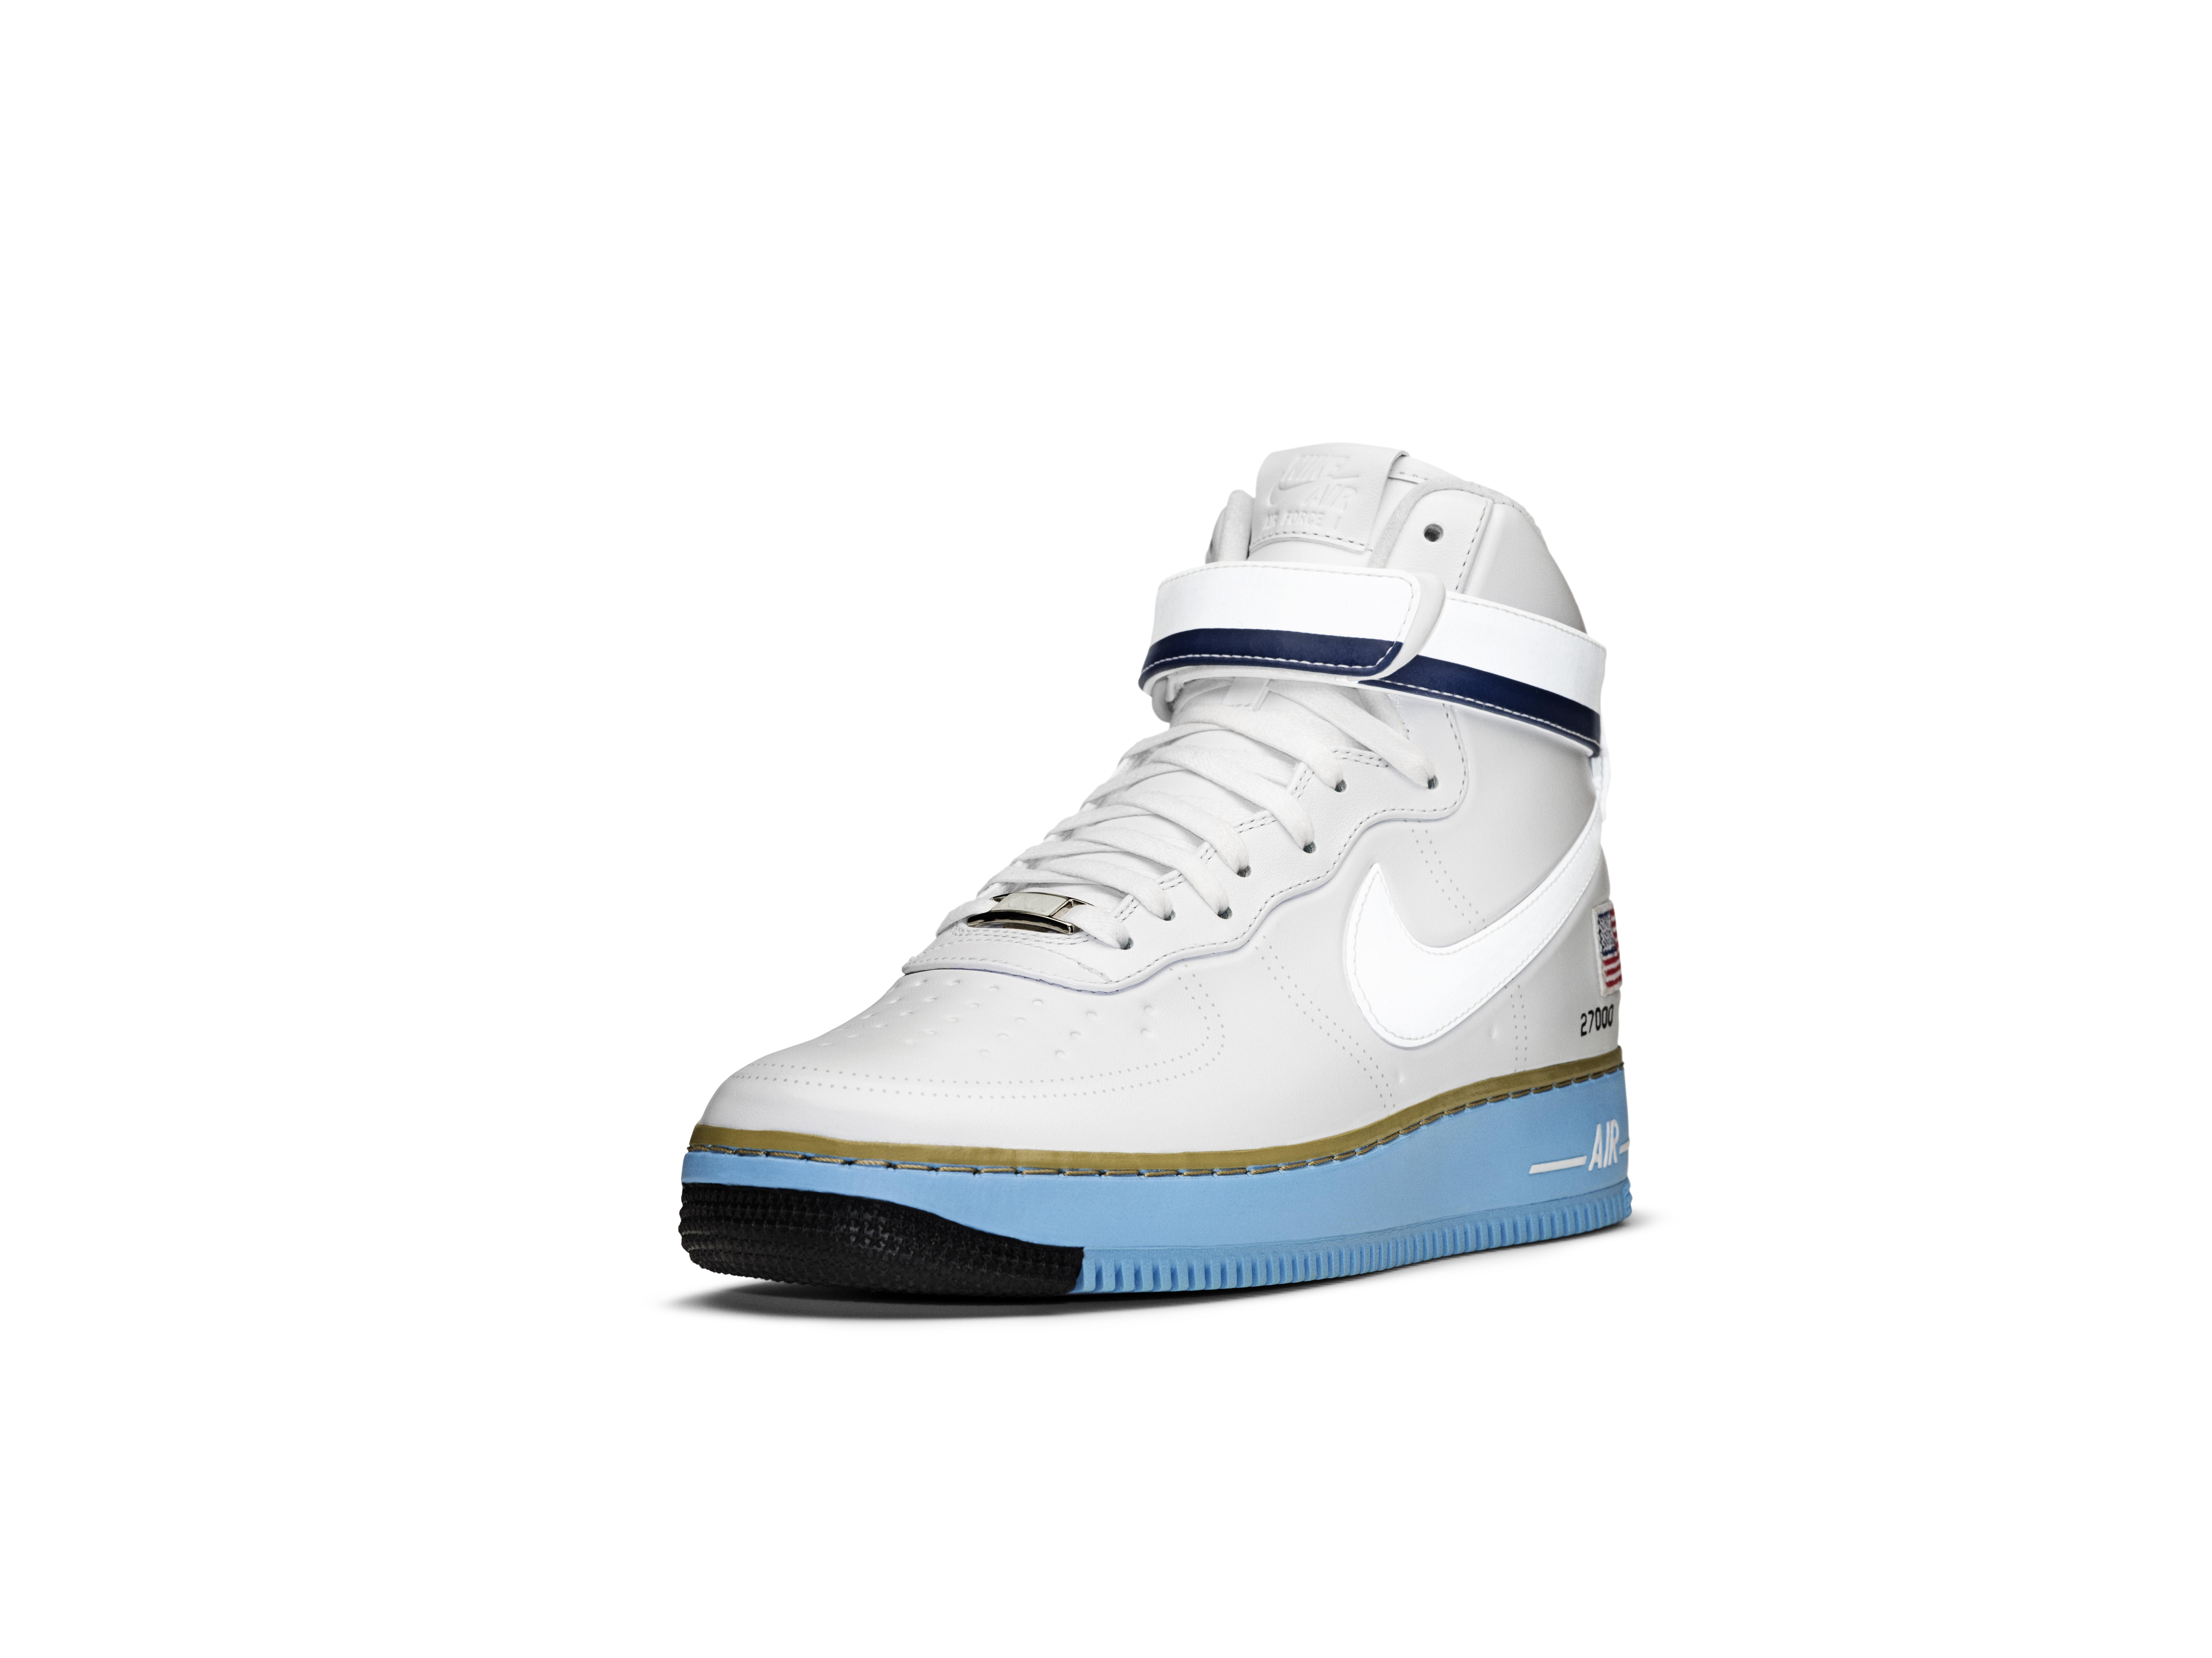 934594adafc9 Discounted 1 Online Force Buy Cheap Air Nike Baby gt off52 z8RwRAUqW